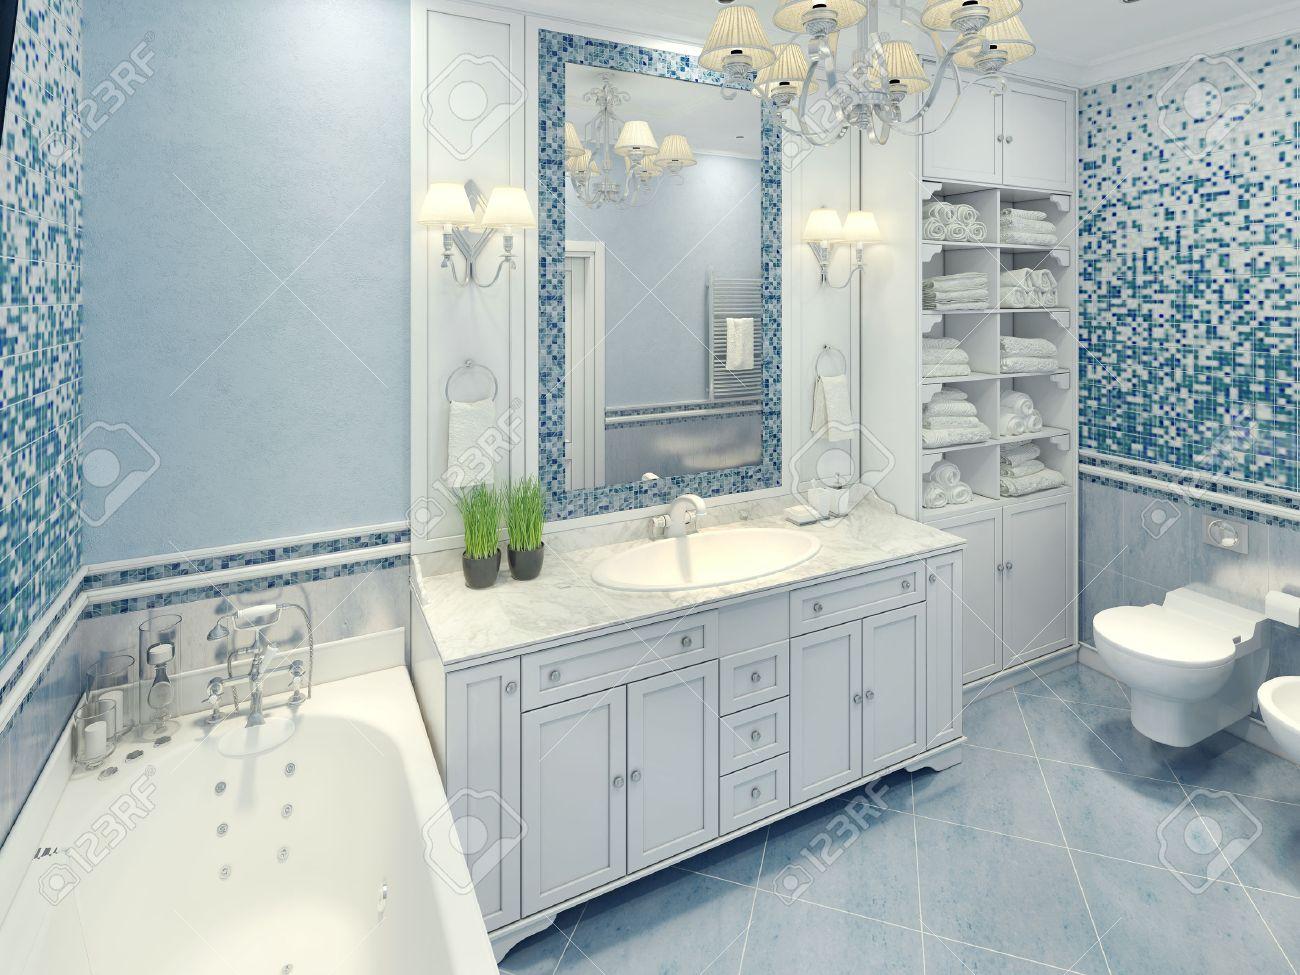 100+ [ foto bagni moderni piccoli ] | bagni moderni e di design ... - Piccoli Bagni Moderni